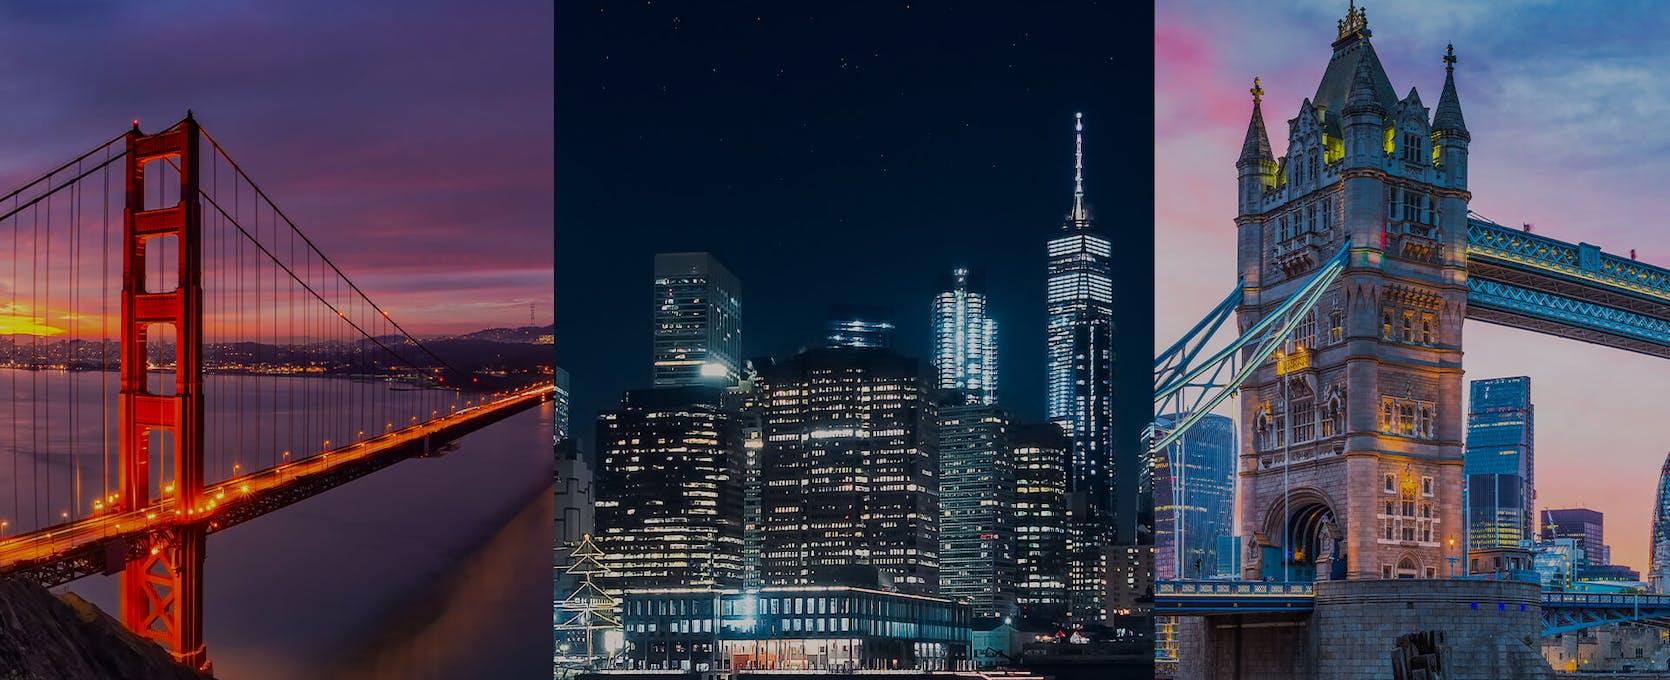 San Francisco, New York and London skylines